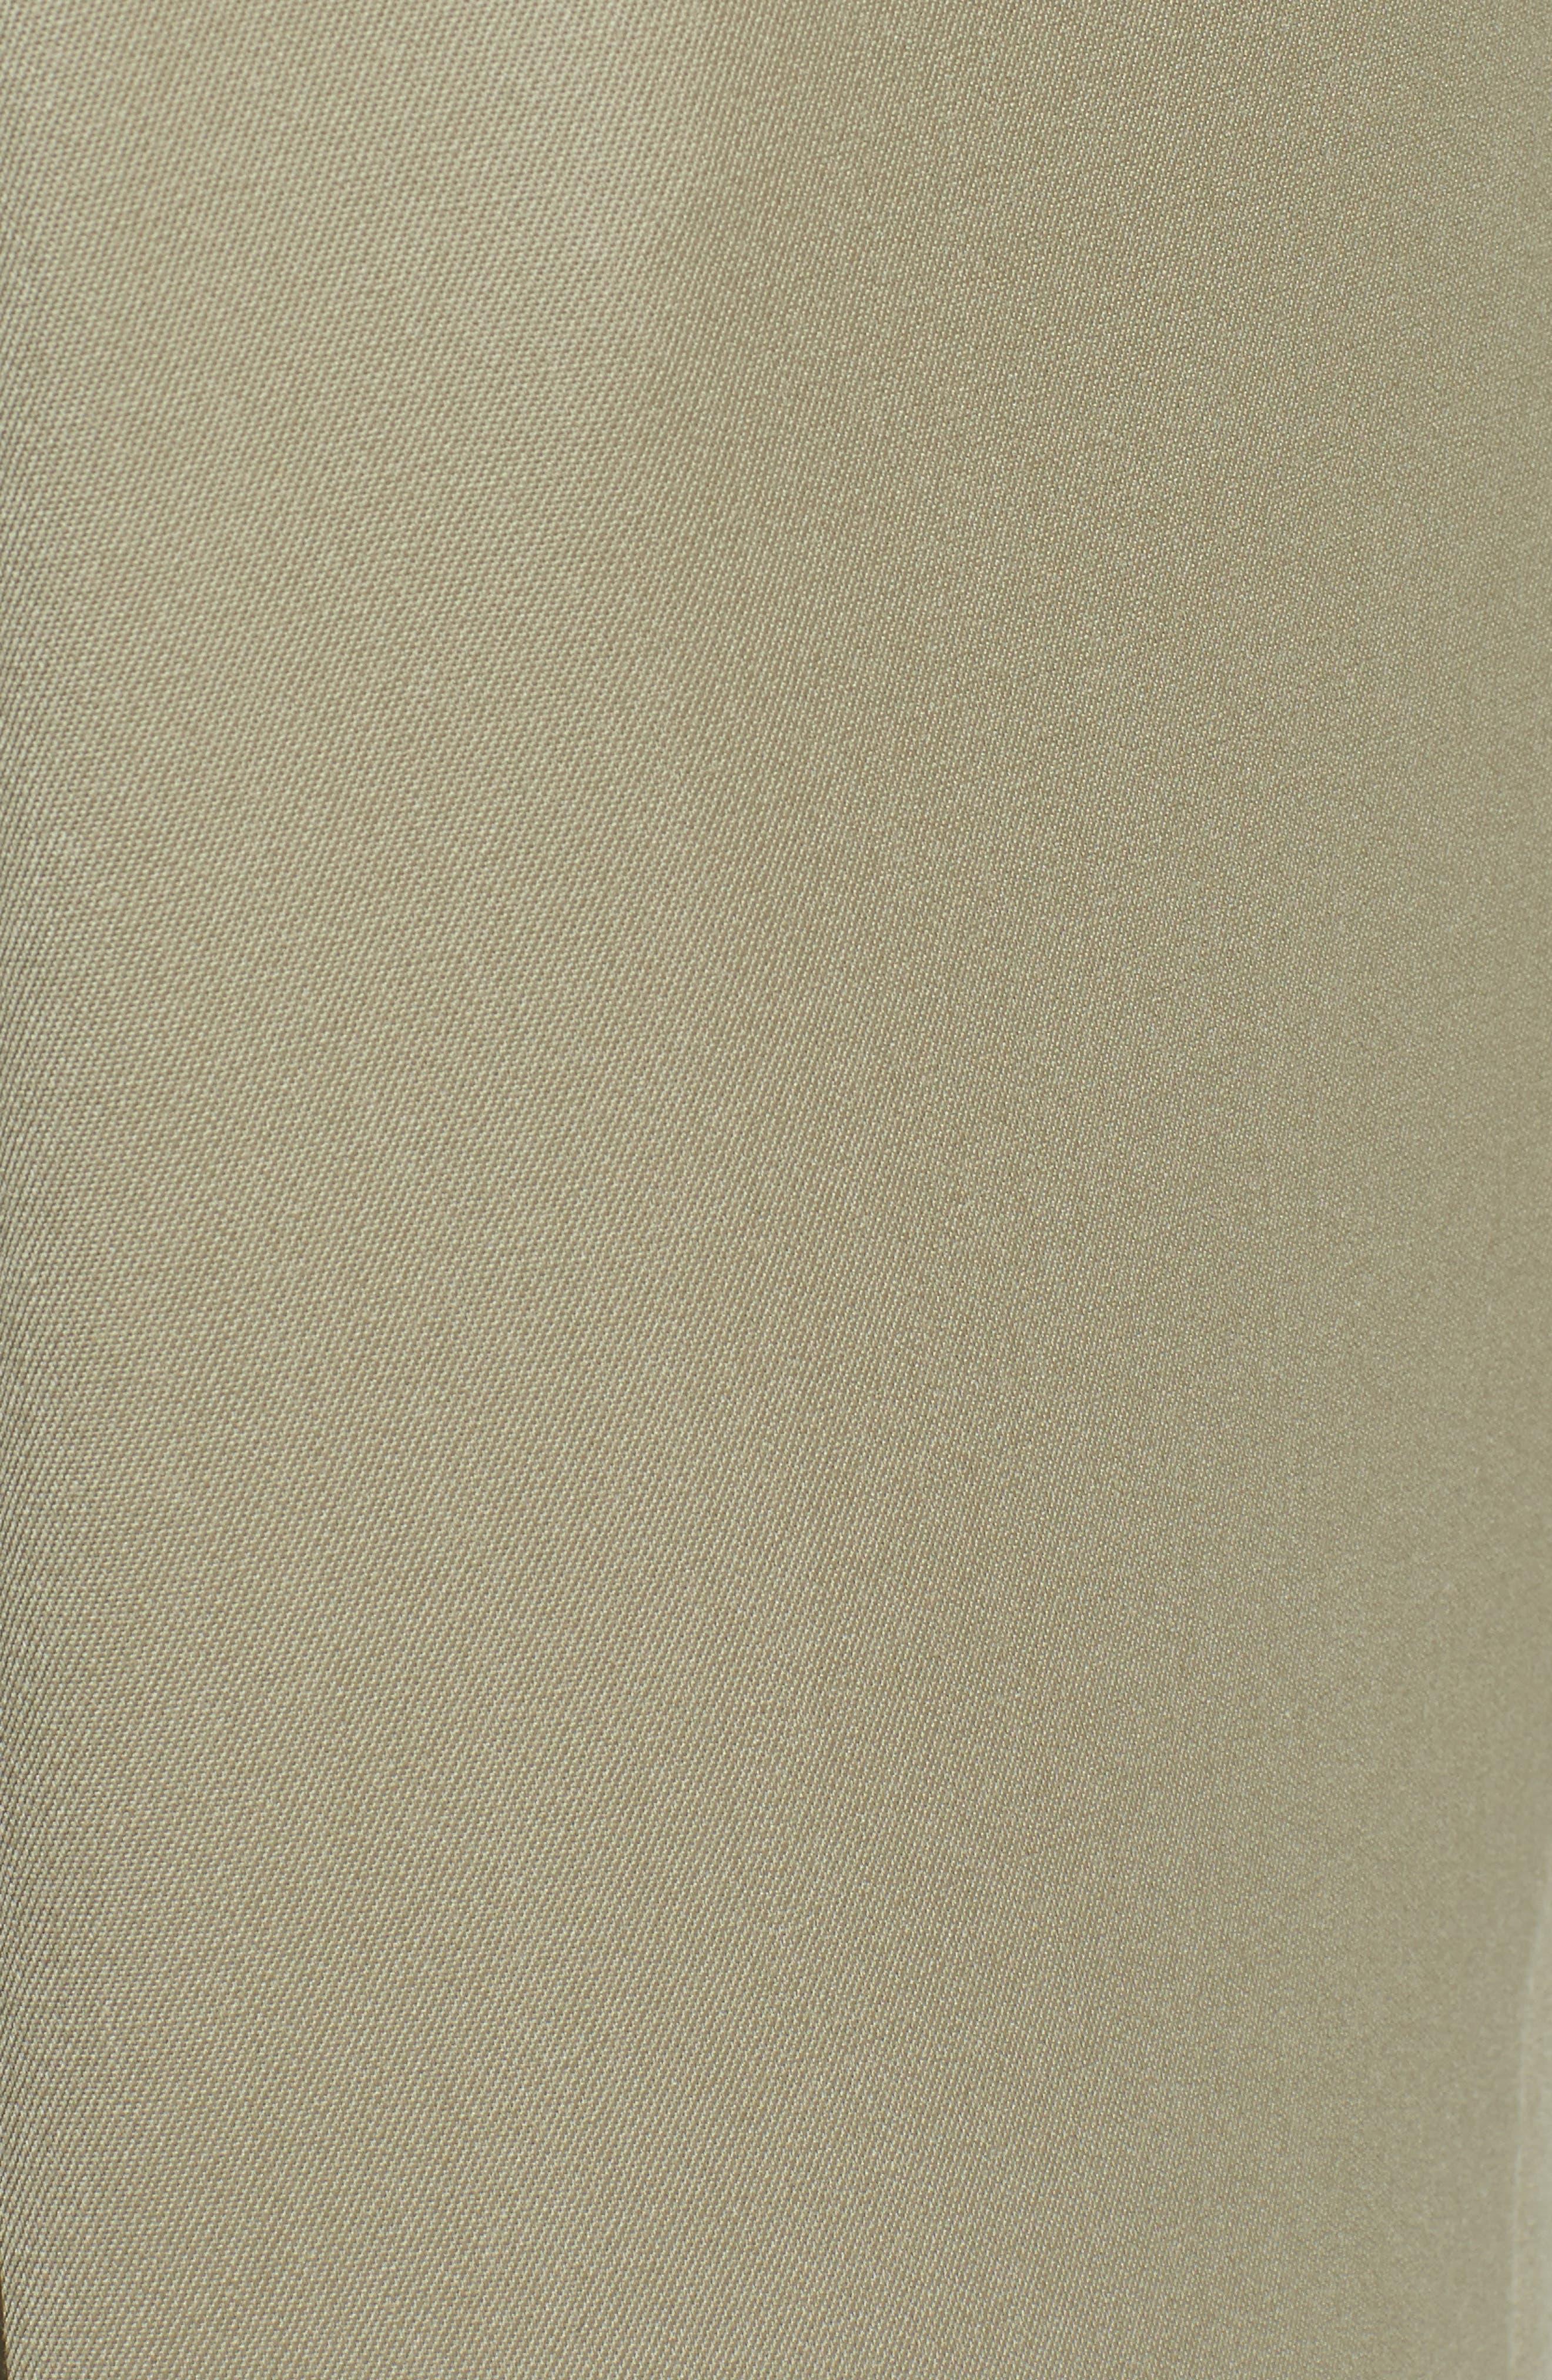 Pleated Wool Gabardine Trousers,                             Alternate thumbnail 6, color,                             TAN